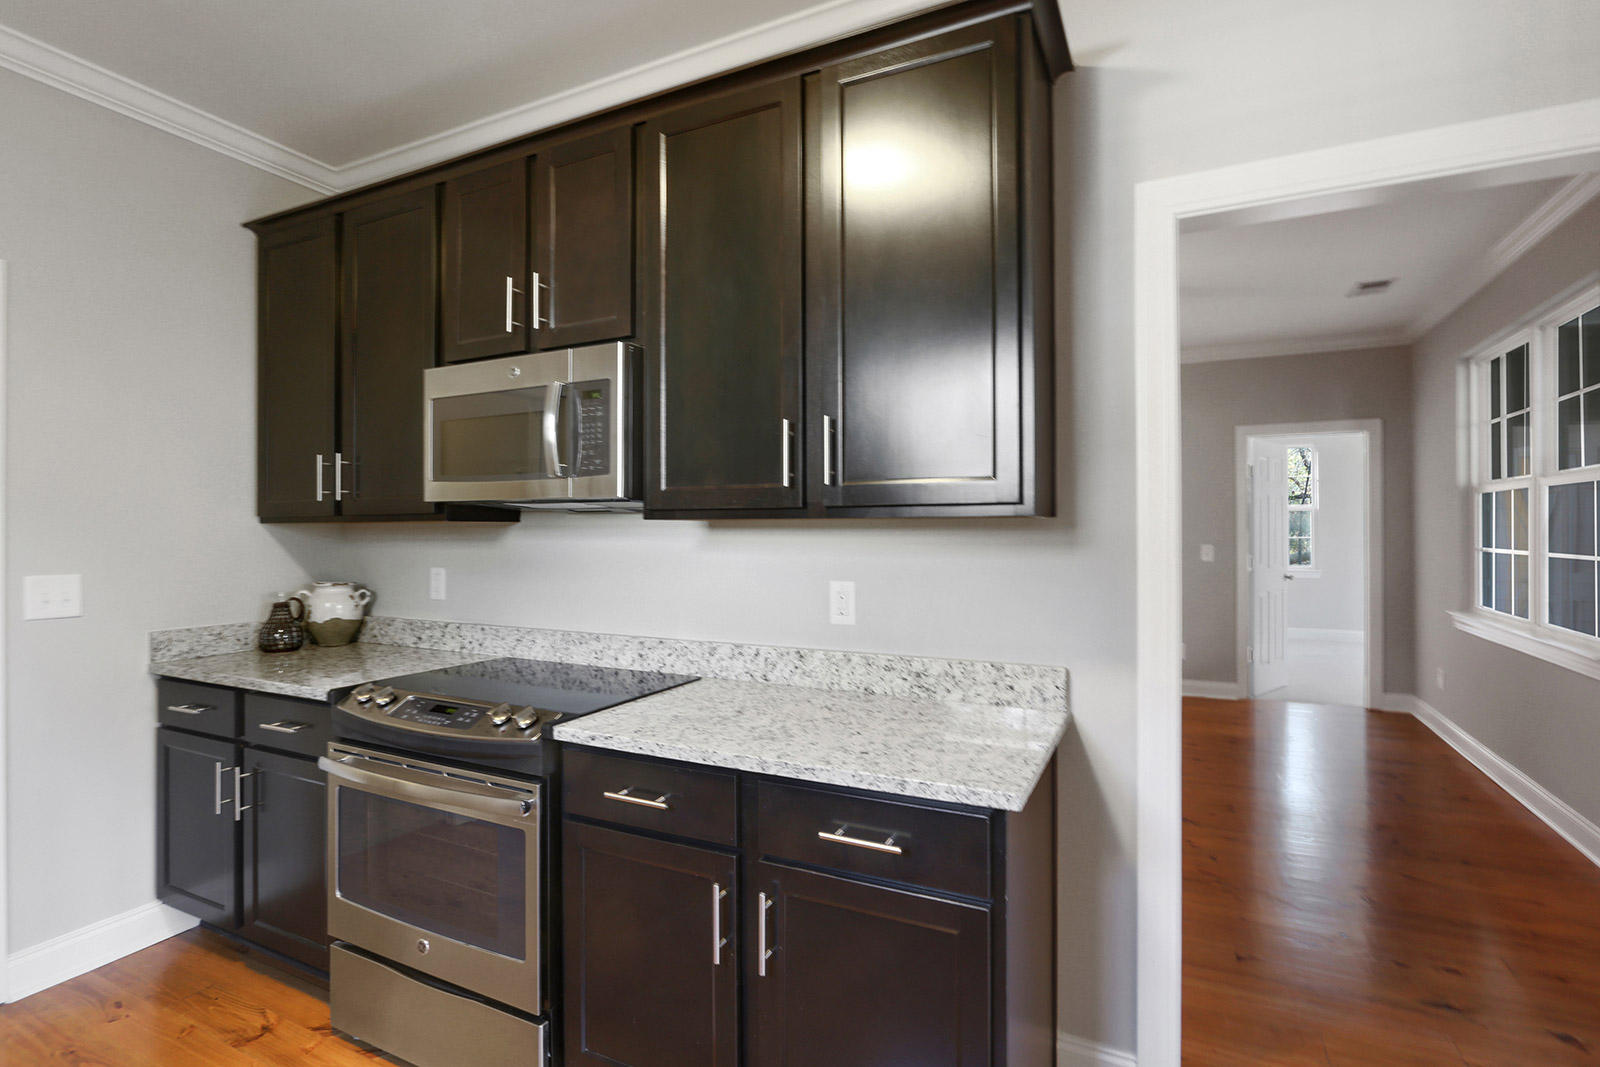 Britton Homes For Sale - 3175 Edenvale, Johns Island, SC - 3